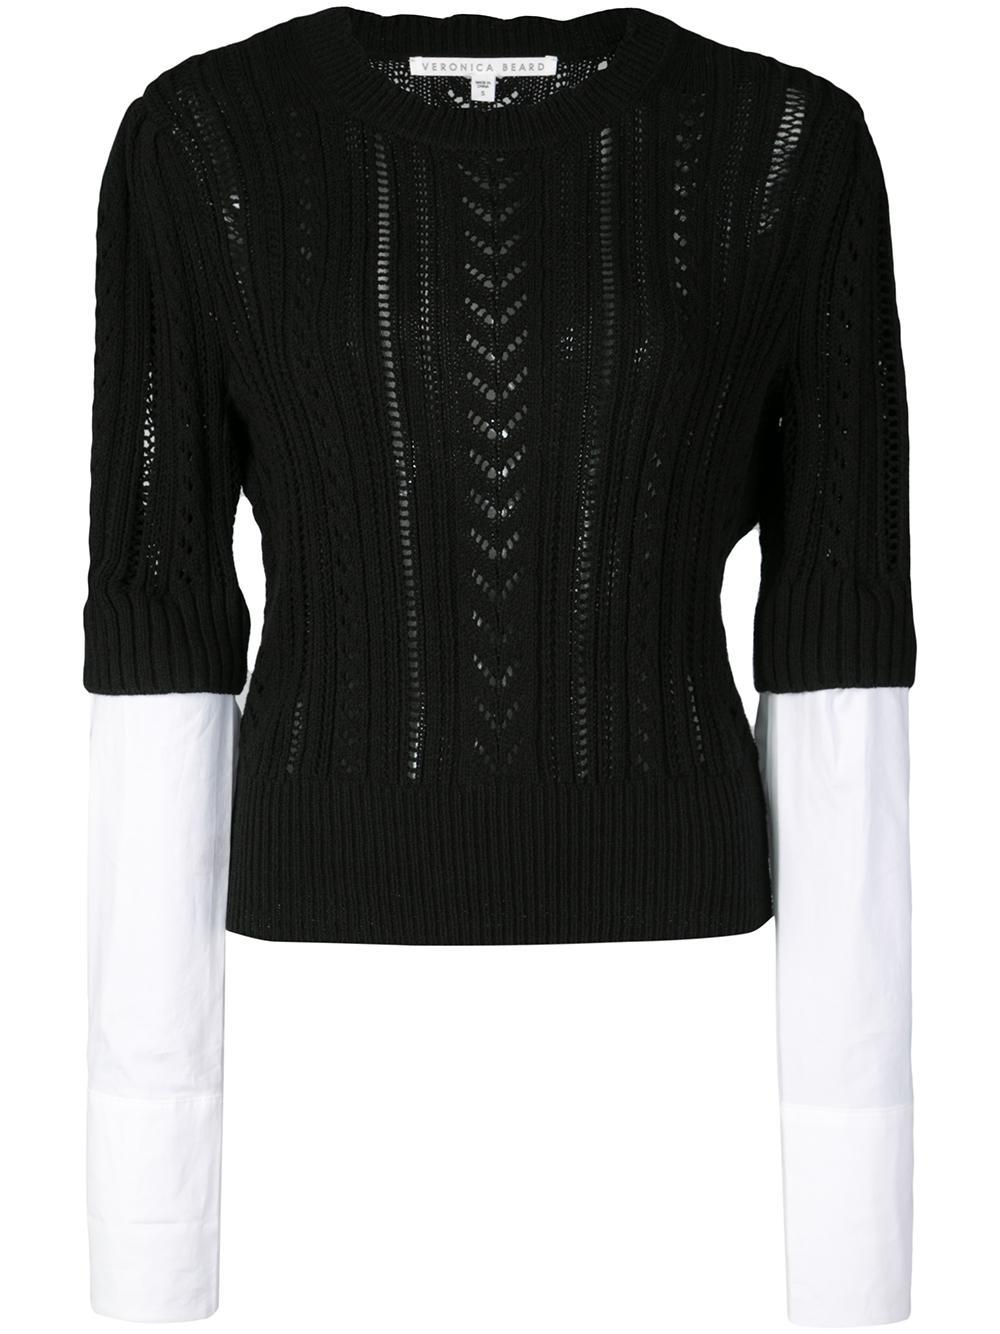 Spence Mixed Media Sweater Item # 1906KN4419290